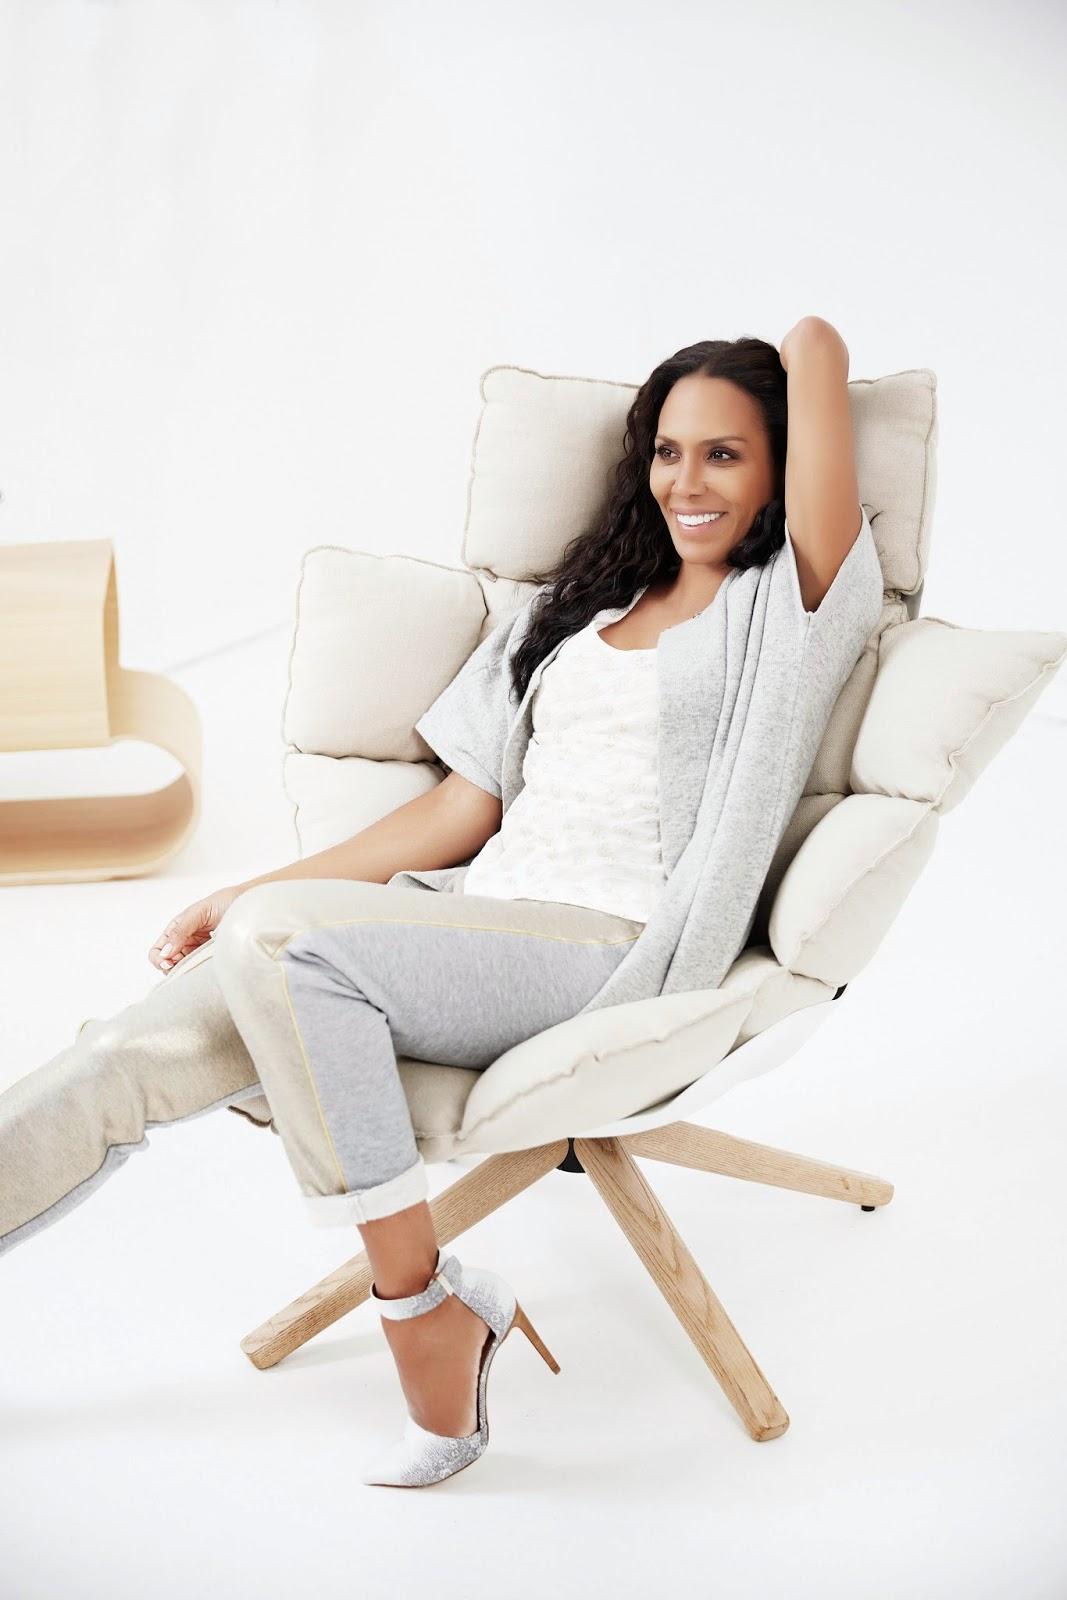 laurus fashiontipps barbara becker modekollektion herbst. Black Bedroom Furniture Sets. Home Design Ideas